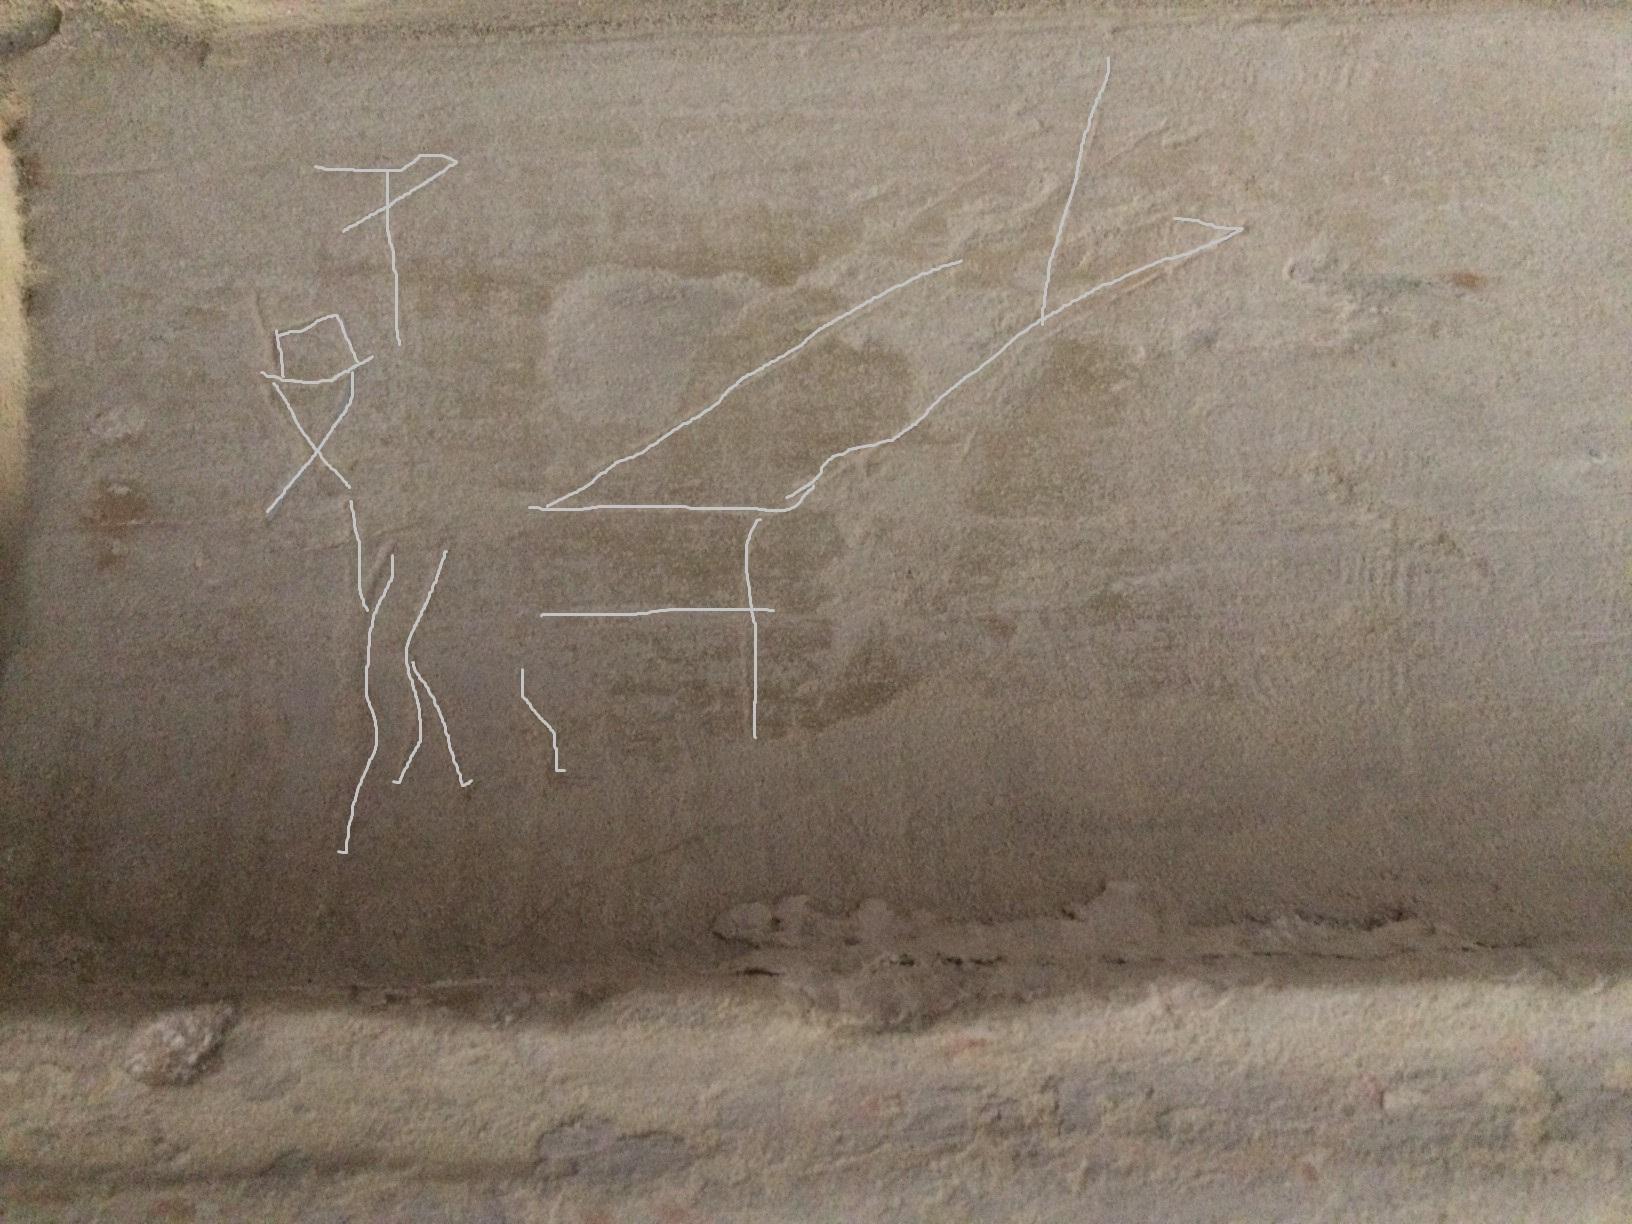 Graffiti 1 - Scratches highlighted